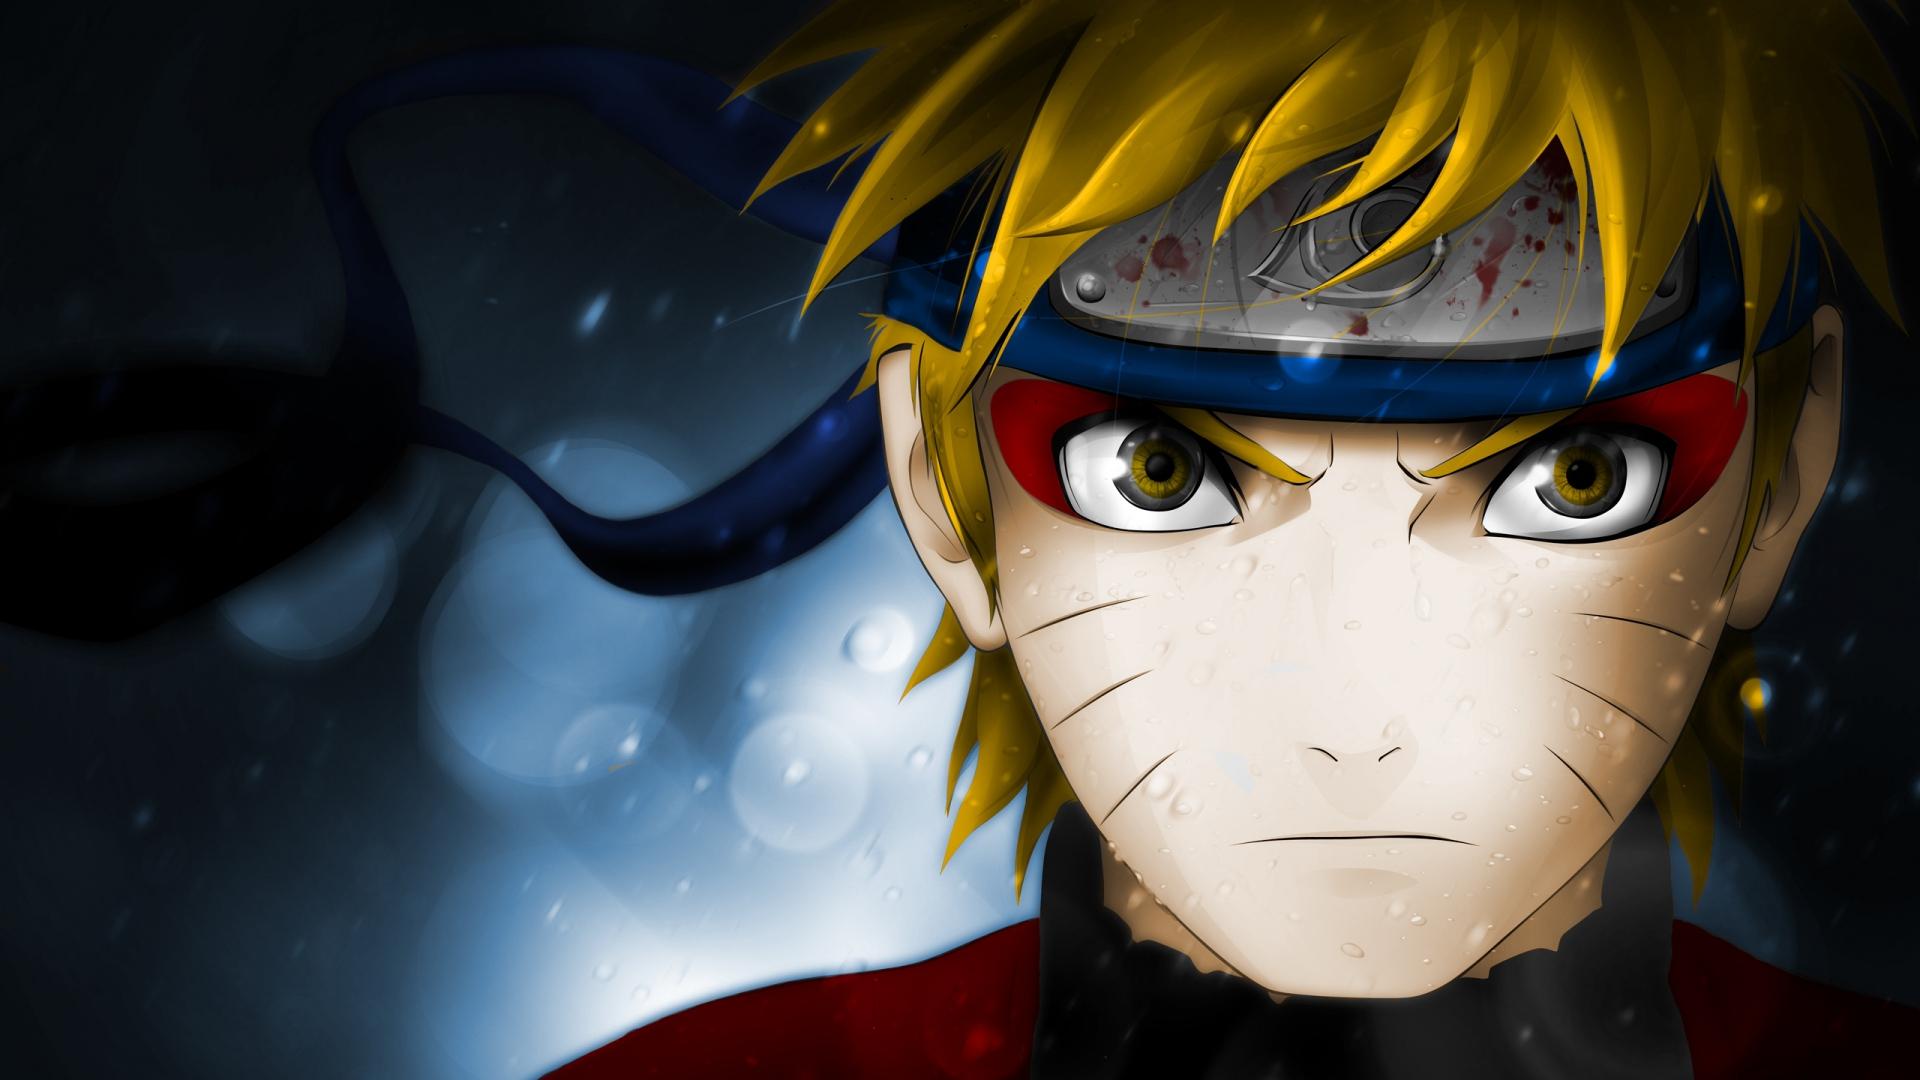 Cool Wallpaper Angry Naruto Uzumaki - guy_blond_naruto_uzumaki_dressing_attitude_drop_angry_16861_1920x1080  Photograph_307417      .jpg